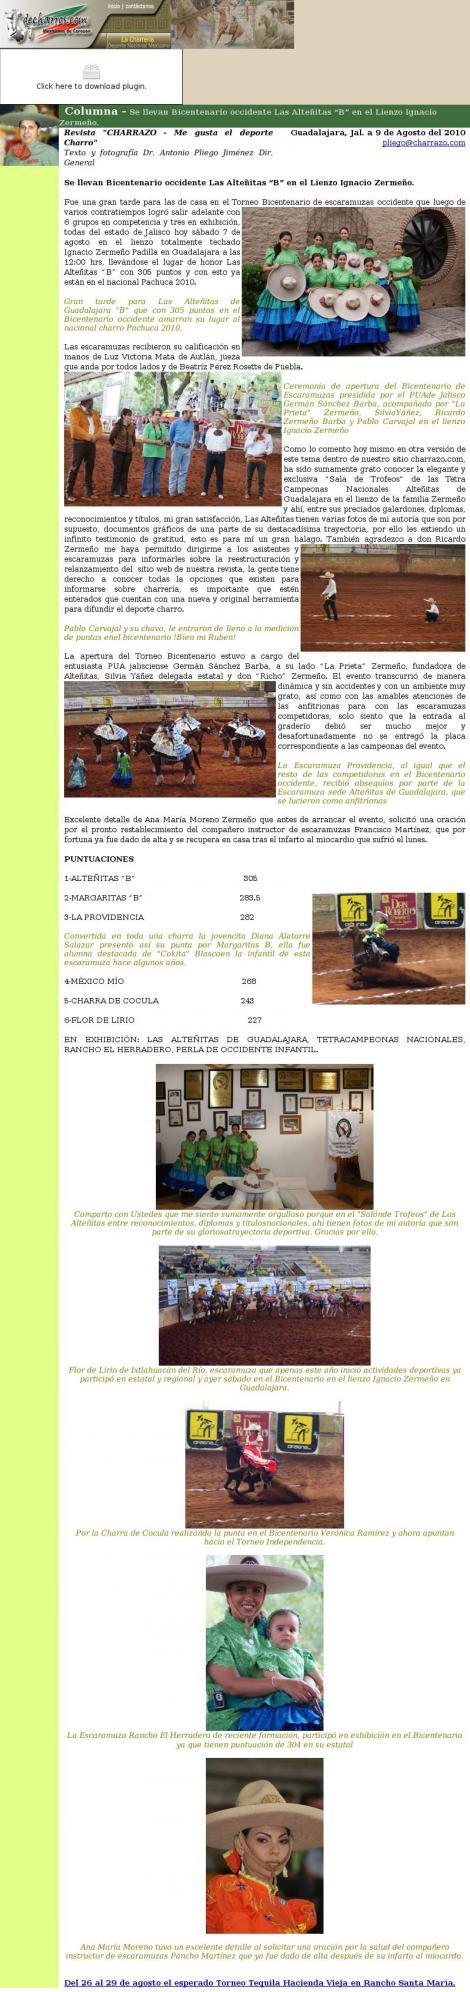 • Zermeno Barba Ignacio • Guadalajara • Jalisco • 73dba776900